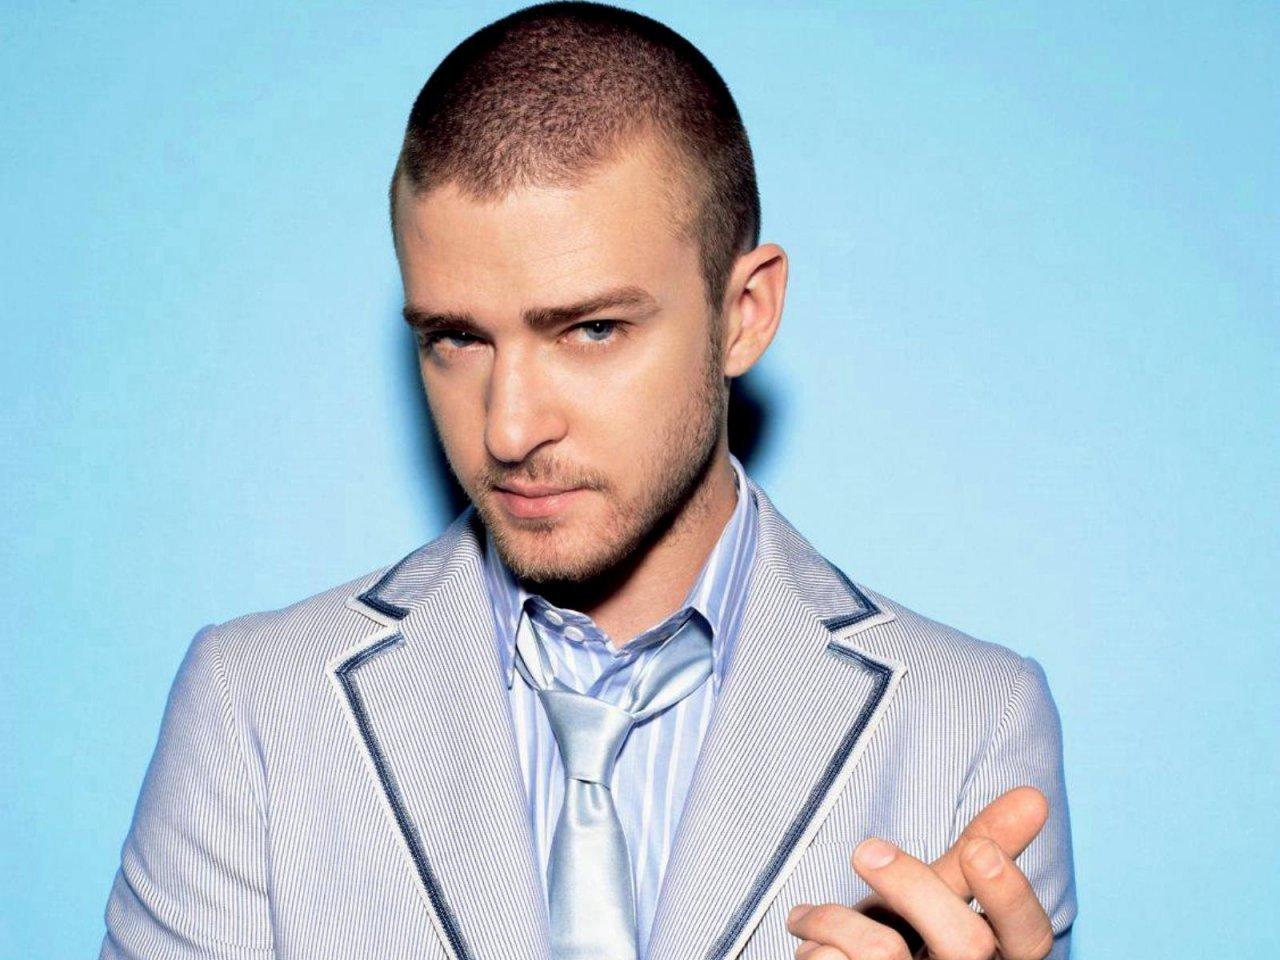 J.T. - Justin Timberlake Wallpaper (18476483) - Fanpop